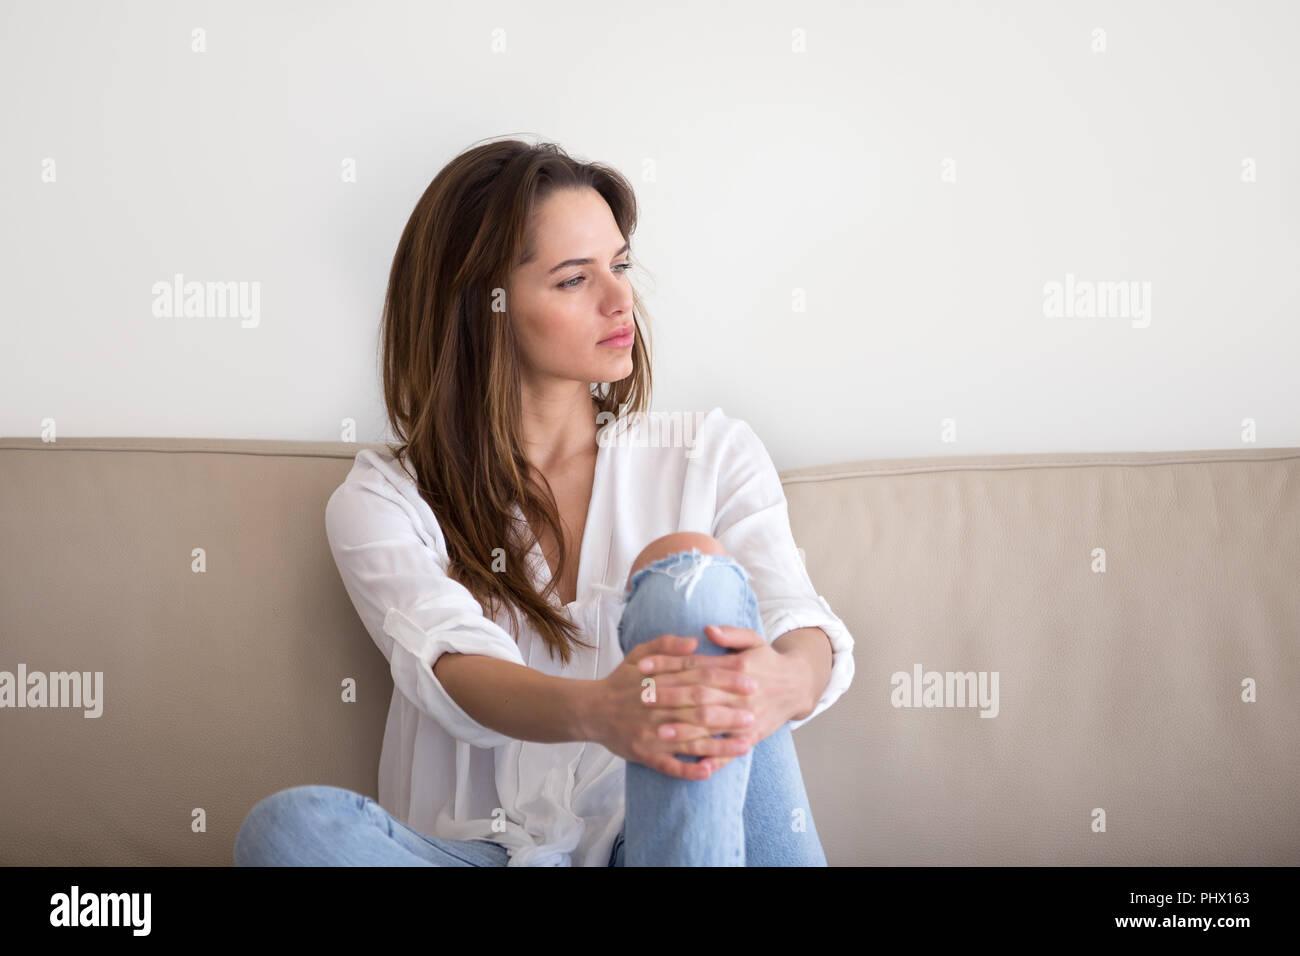 Thoughtful pensive millennial woman sitting on sofa feeling lone - Stock Image